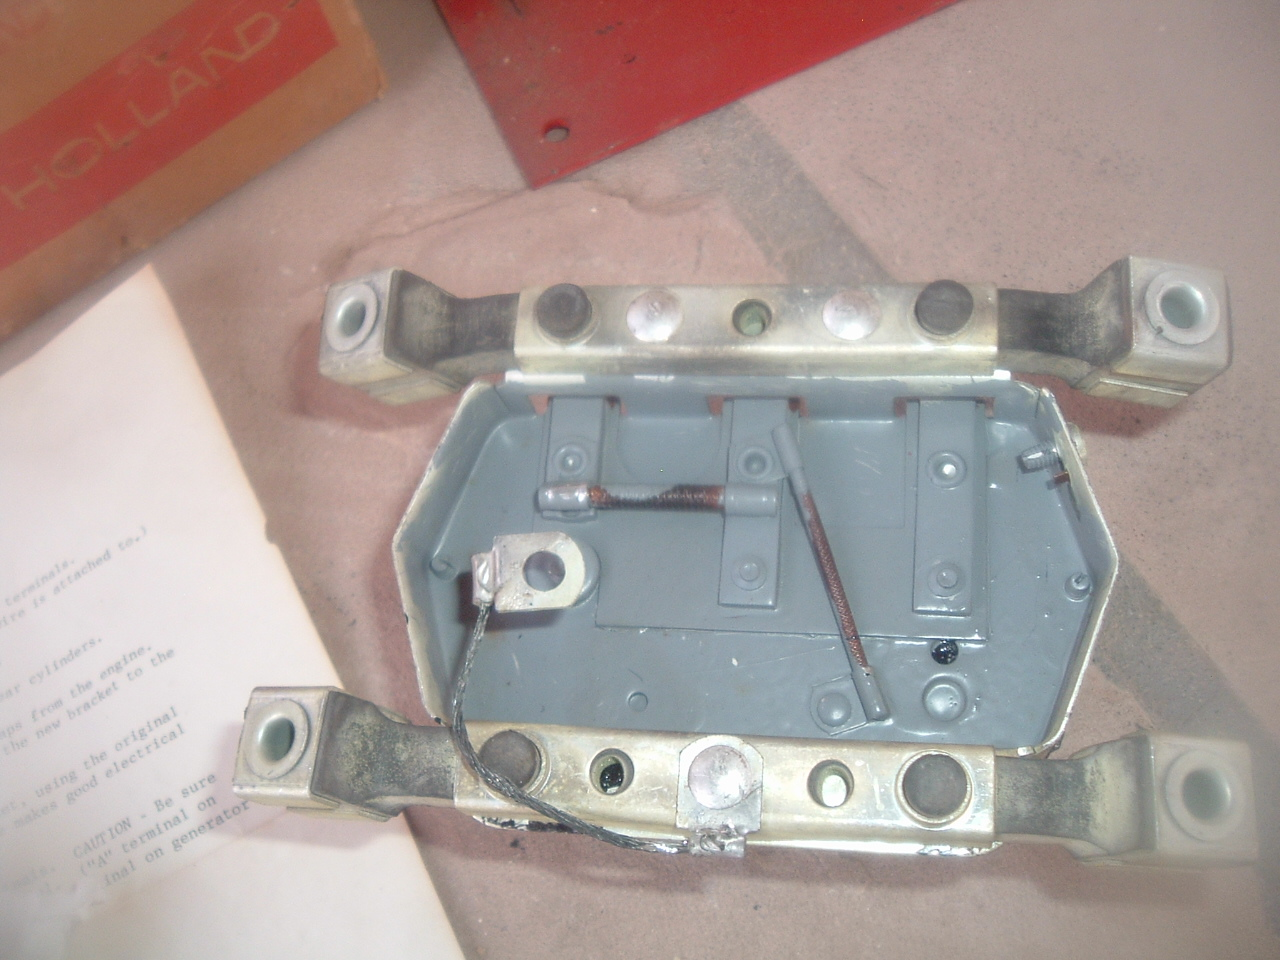 prestolite new voltage regulator 1949 wisconsin VG4D engine # VBO-4201-AD-3